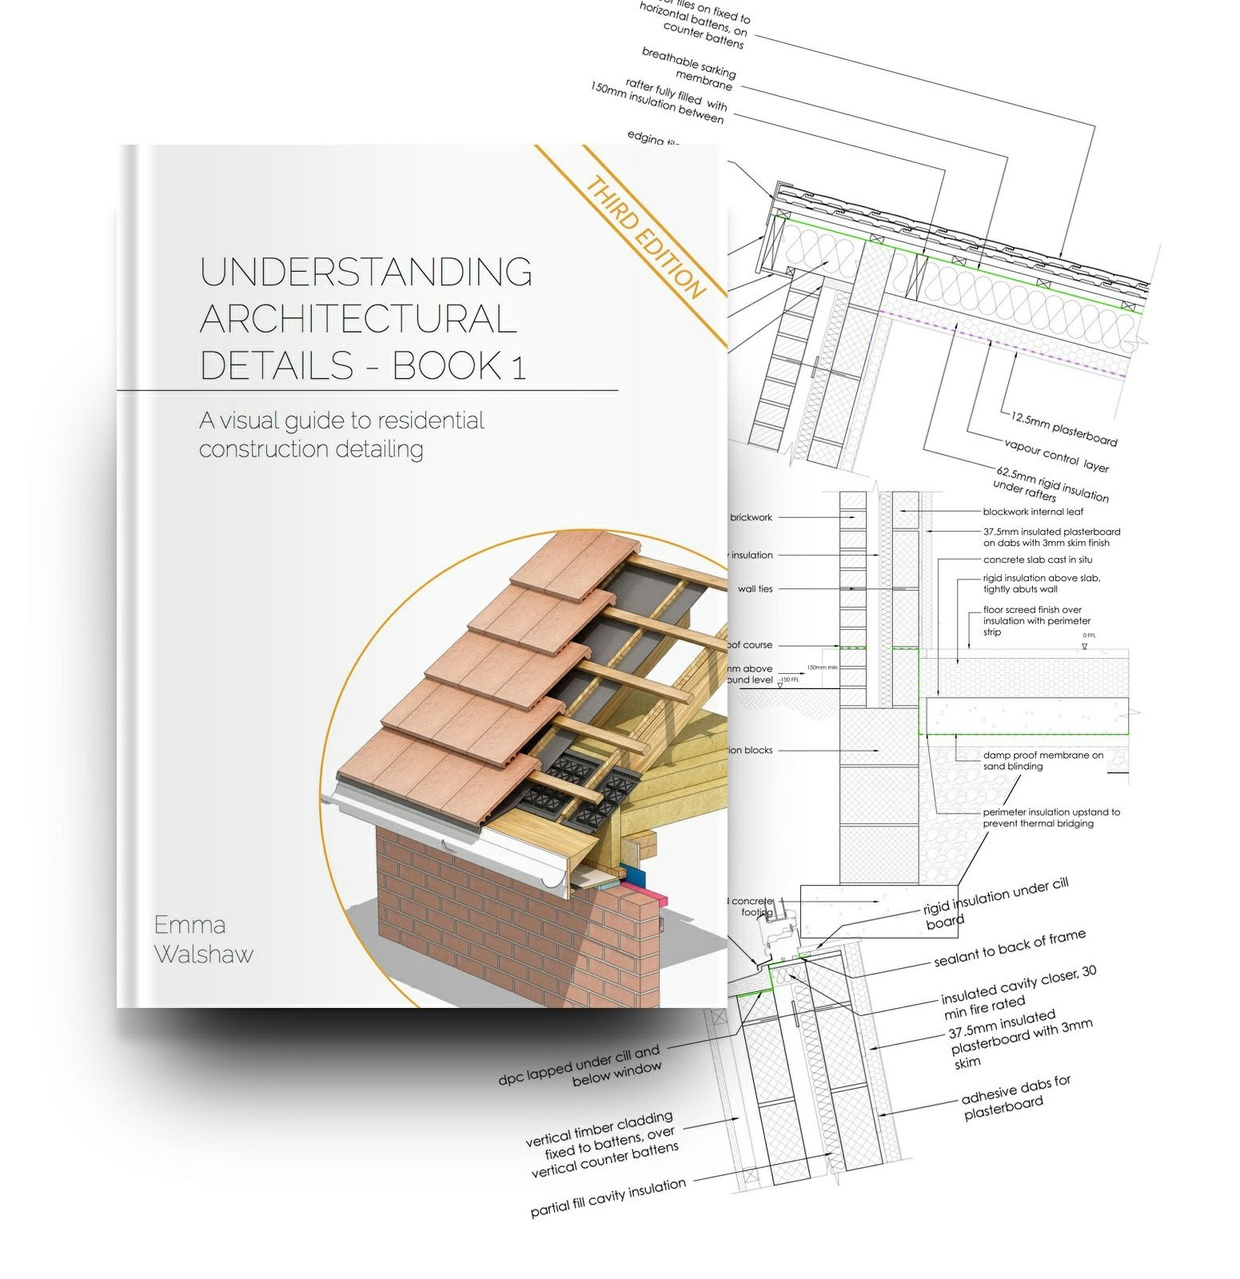 Understanding Architectural Details (3rd Edition) - Bundle 2